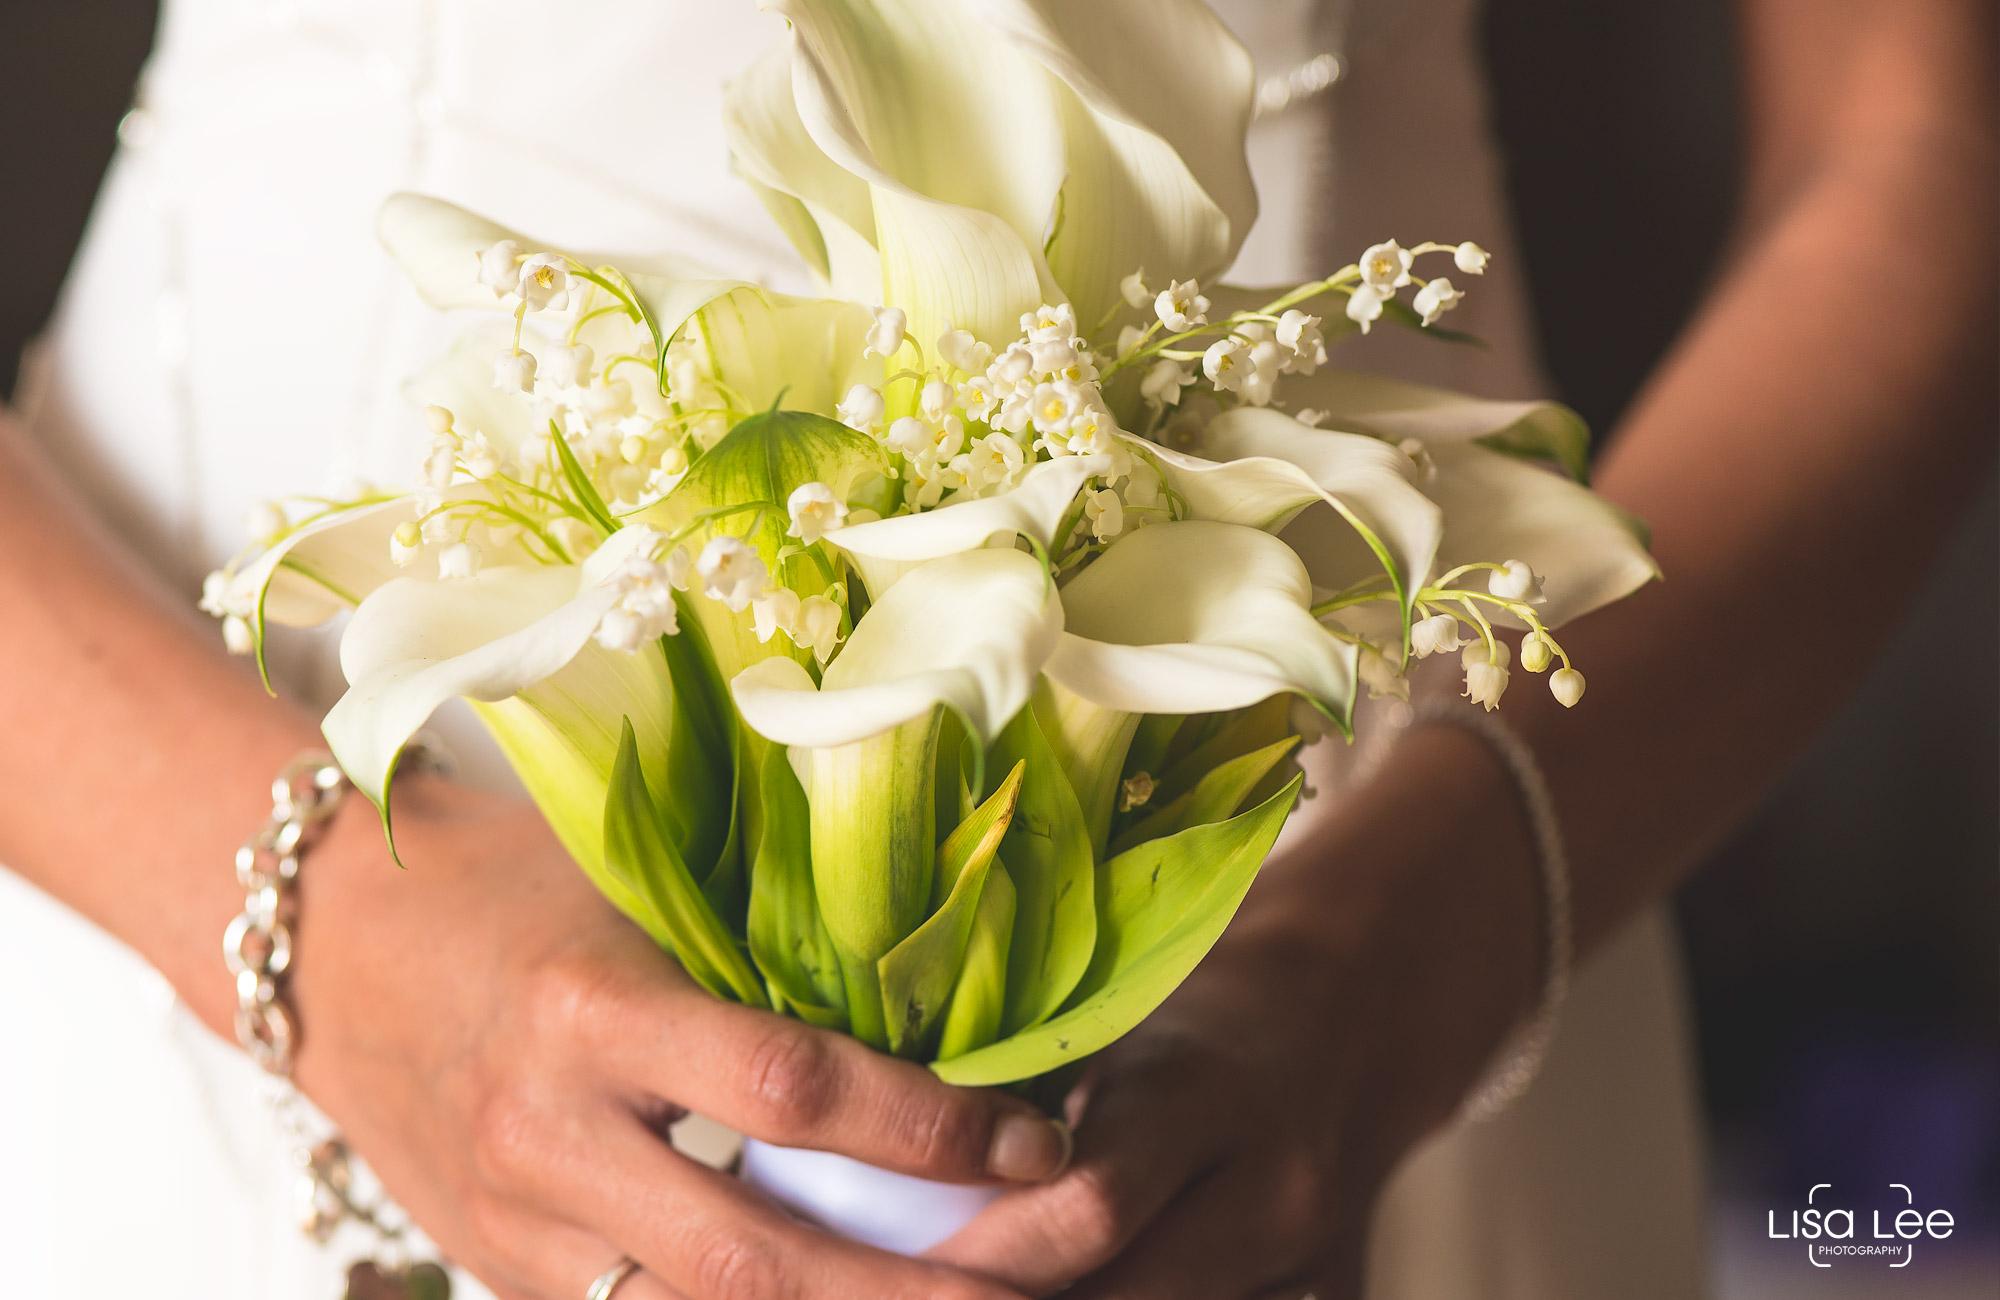 lisa-lee-wedding-photography-christchurch-dorset-flowers.jpg